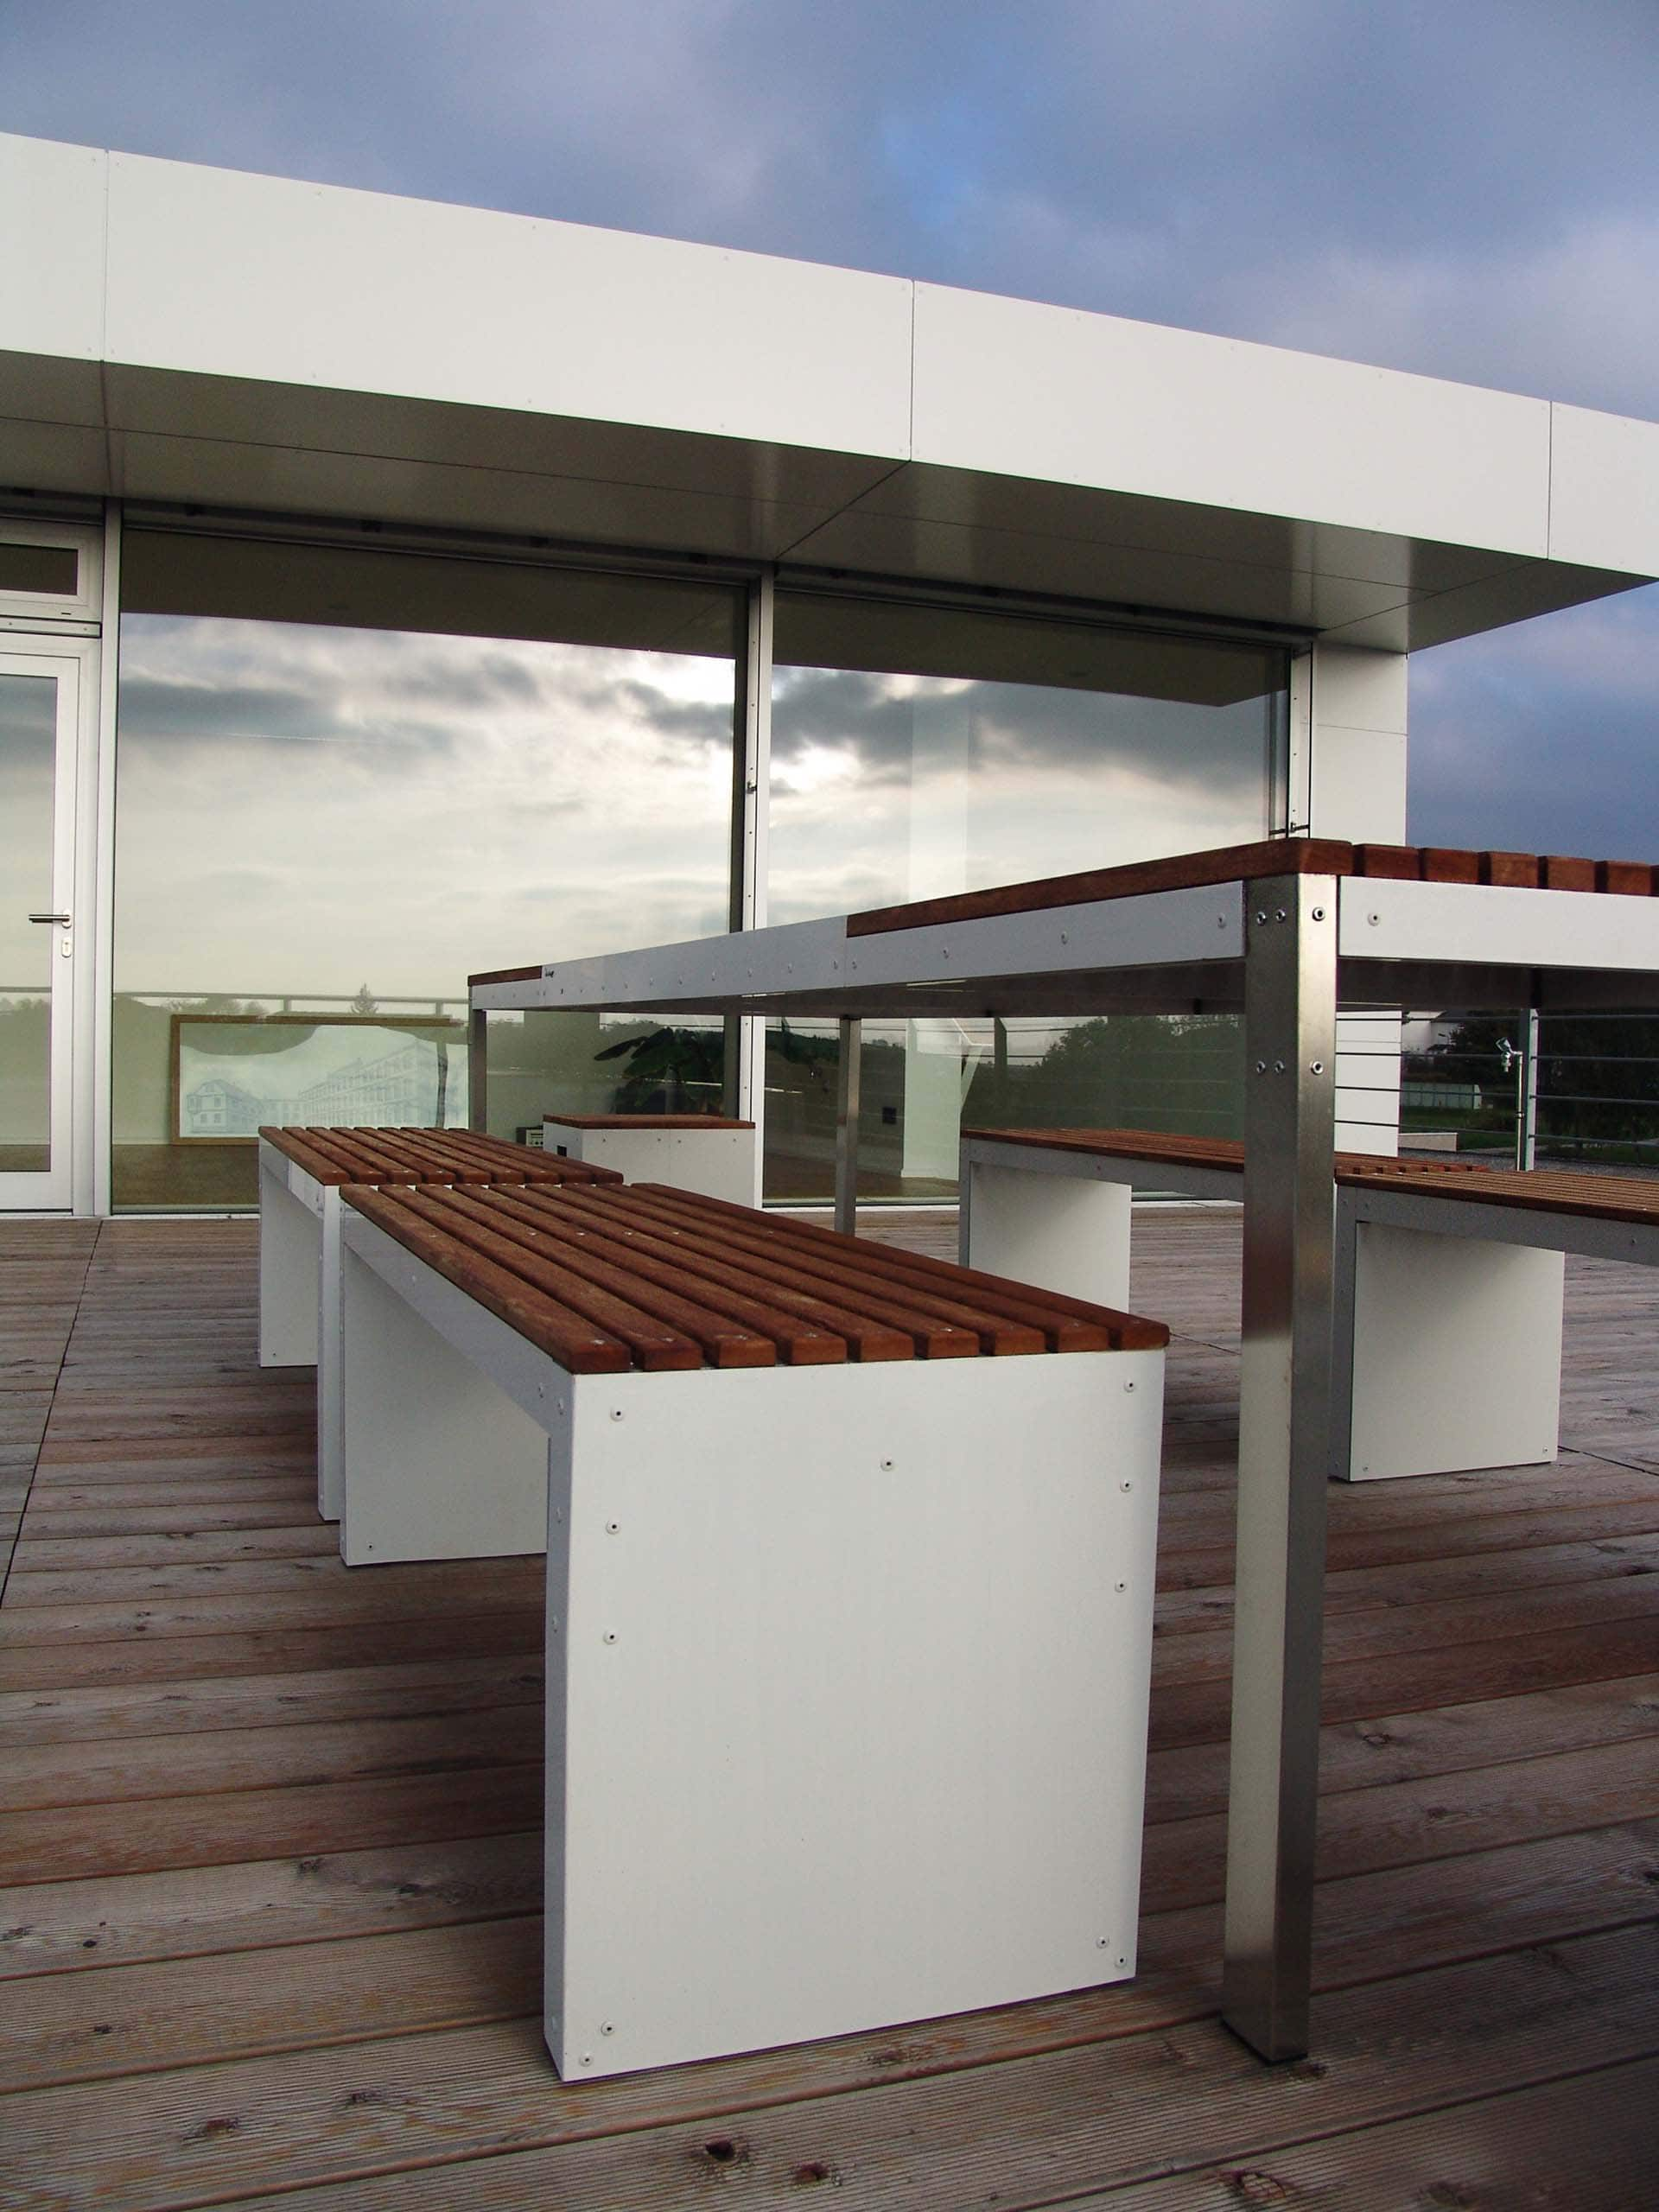 Design Tisch Sealine Nummer 2 aus Holz Edelstahl by Sebastian Bohry